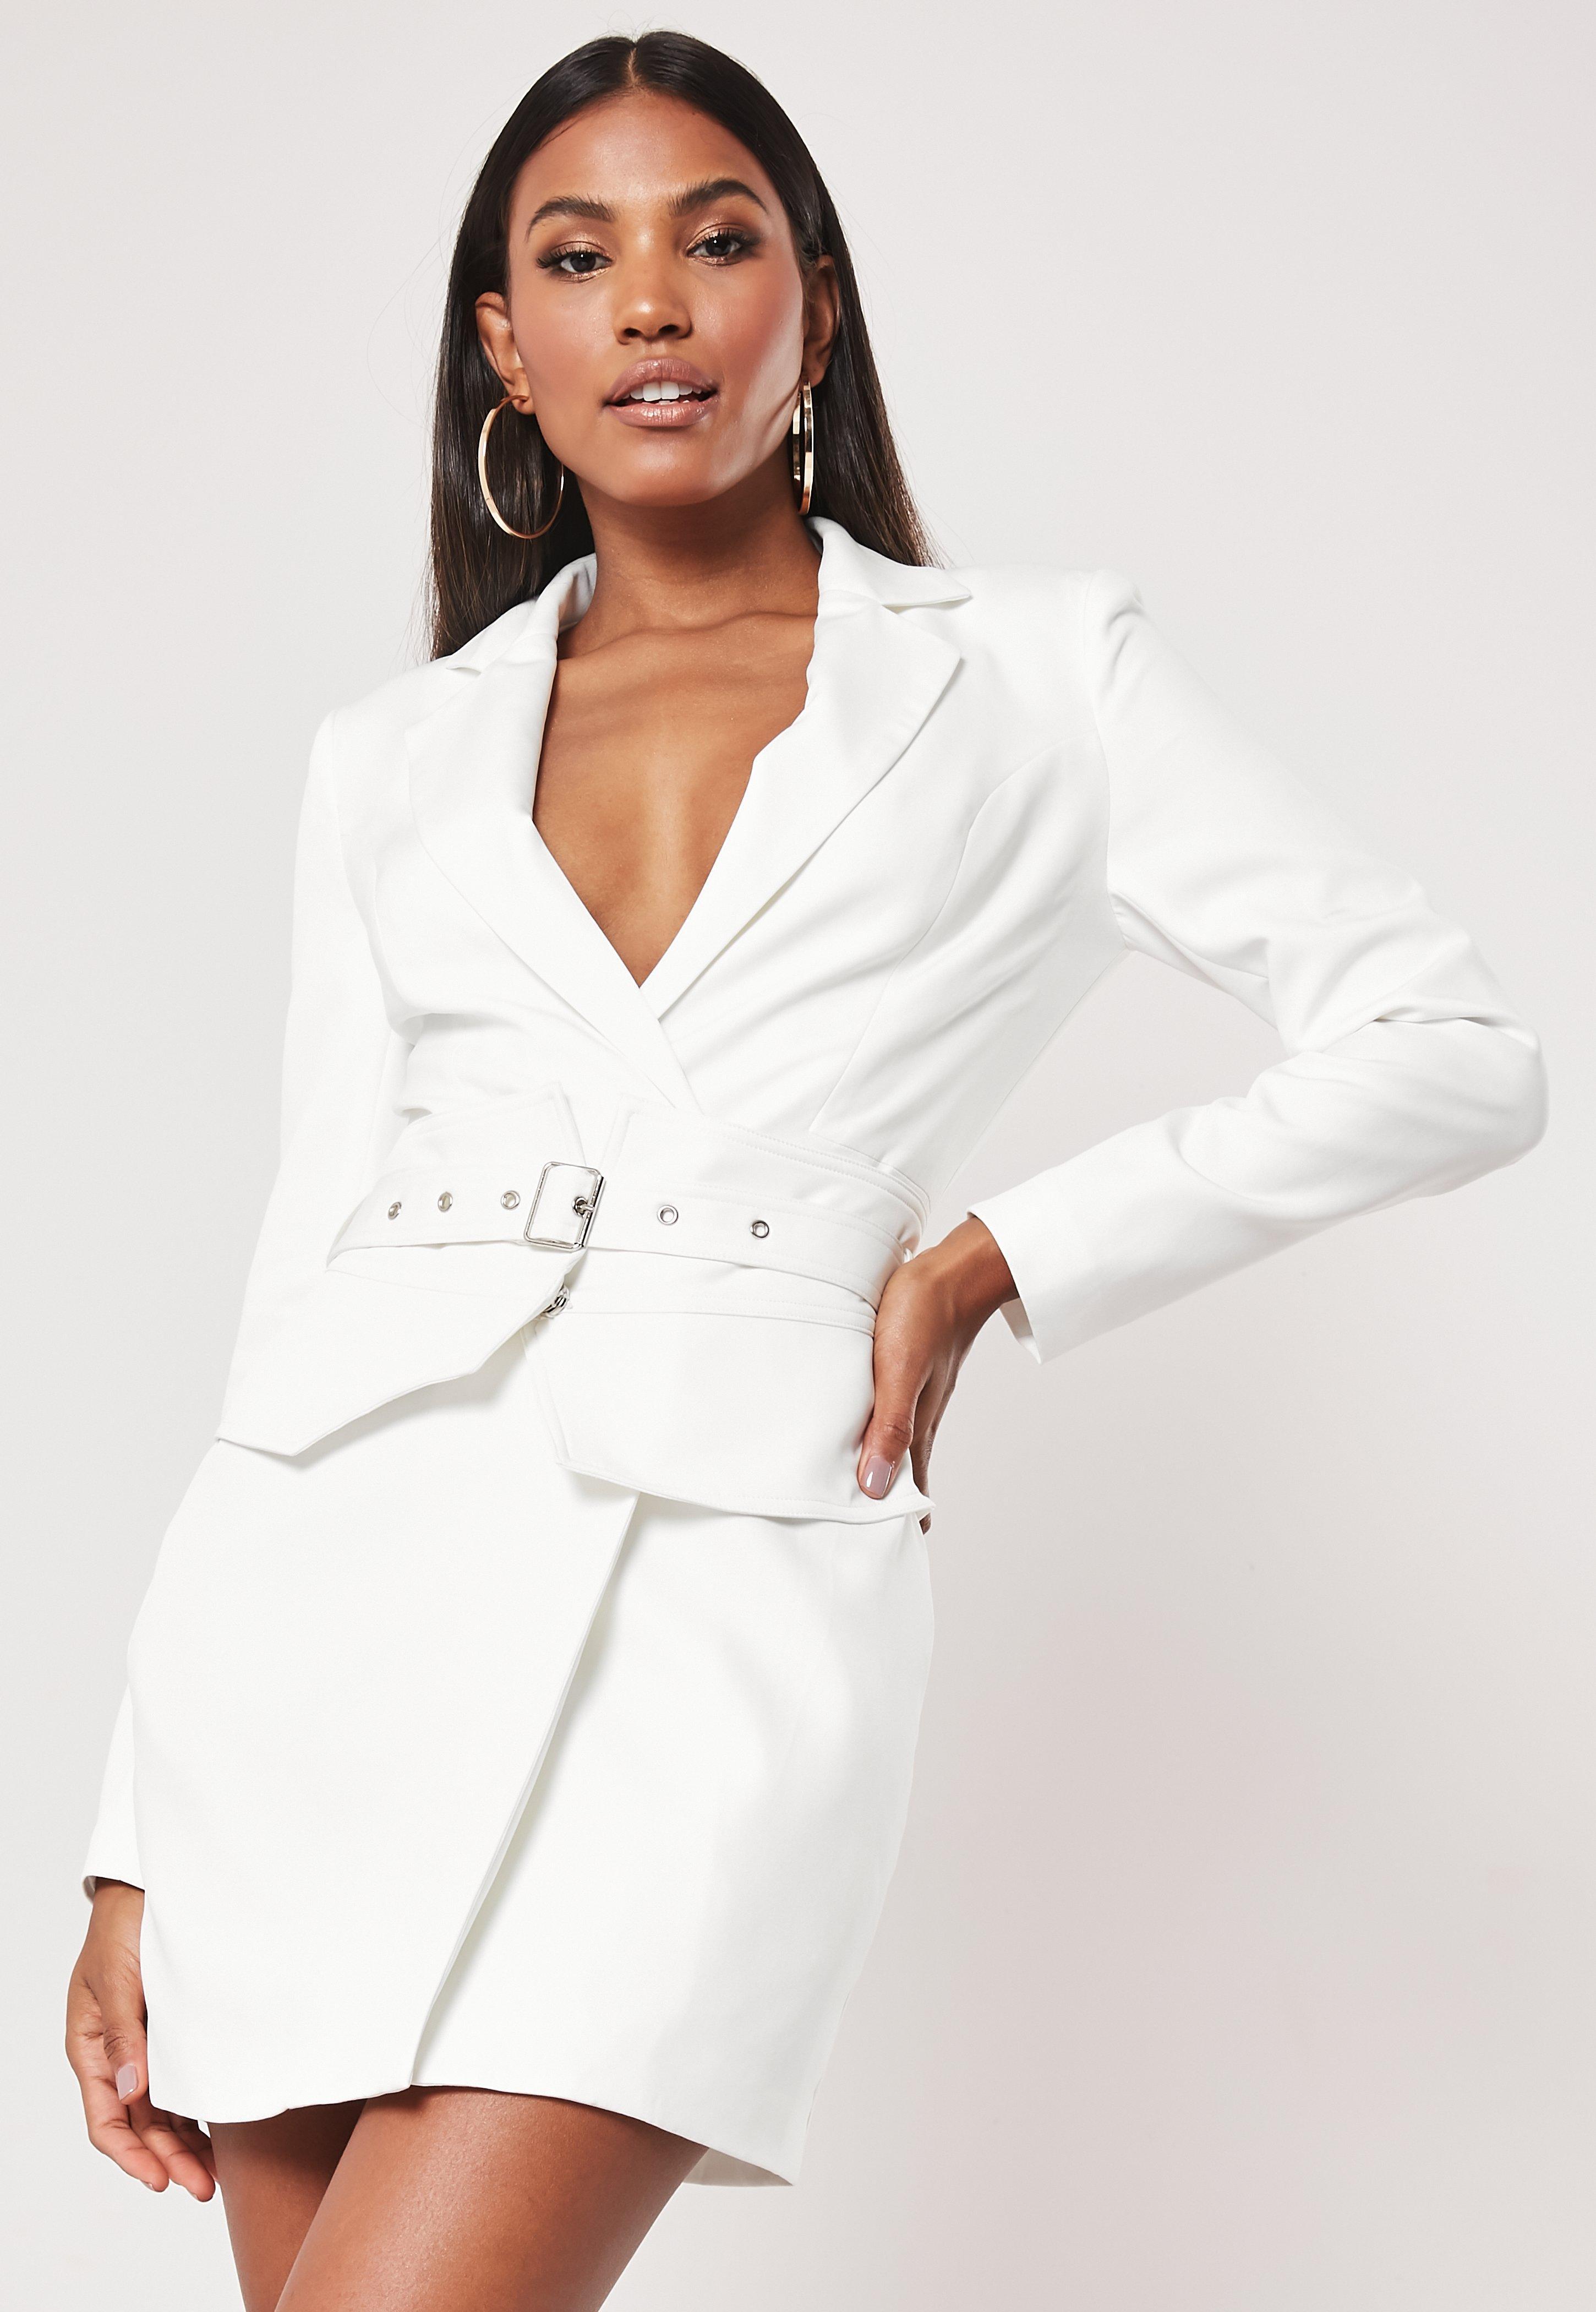 ca9078020a7 Blazer Dresses - Women s Tuxedo Dresses Online